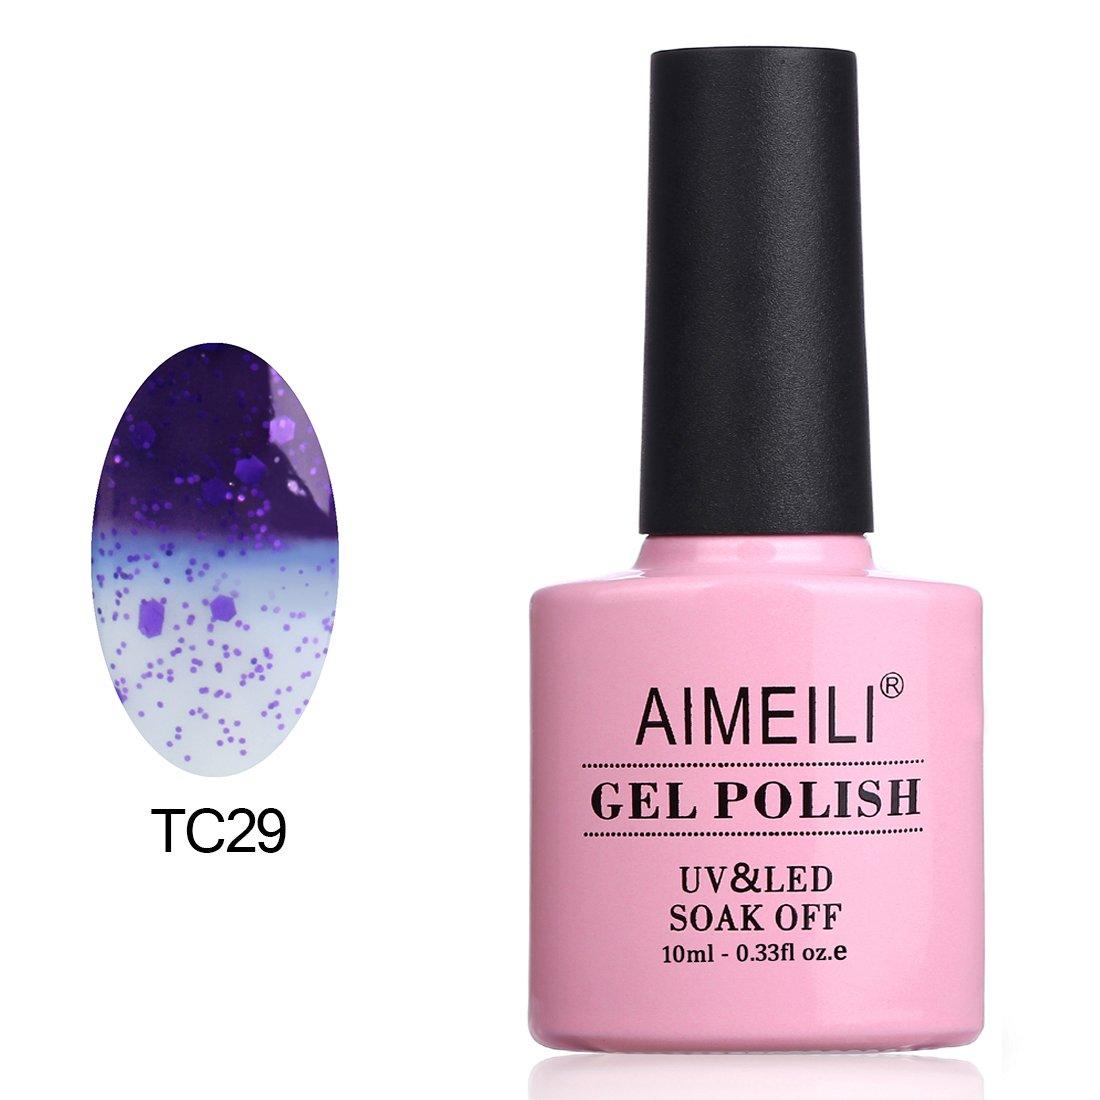 AIMEILI Soak Off UV LED Temperature Color Changing Chameleon Gel Nail Polish - Glitter Purple to Transparent (TC29) 10ml